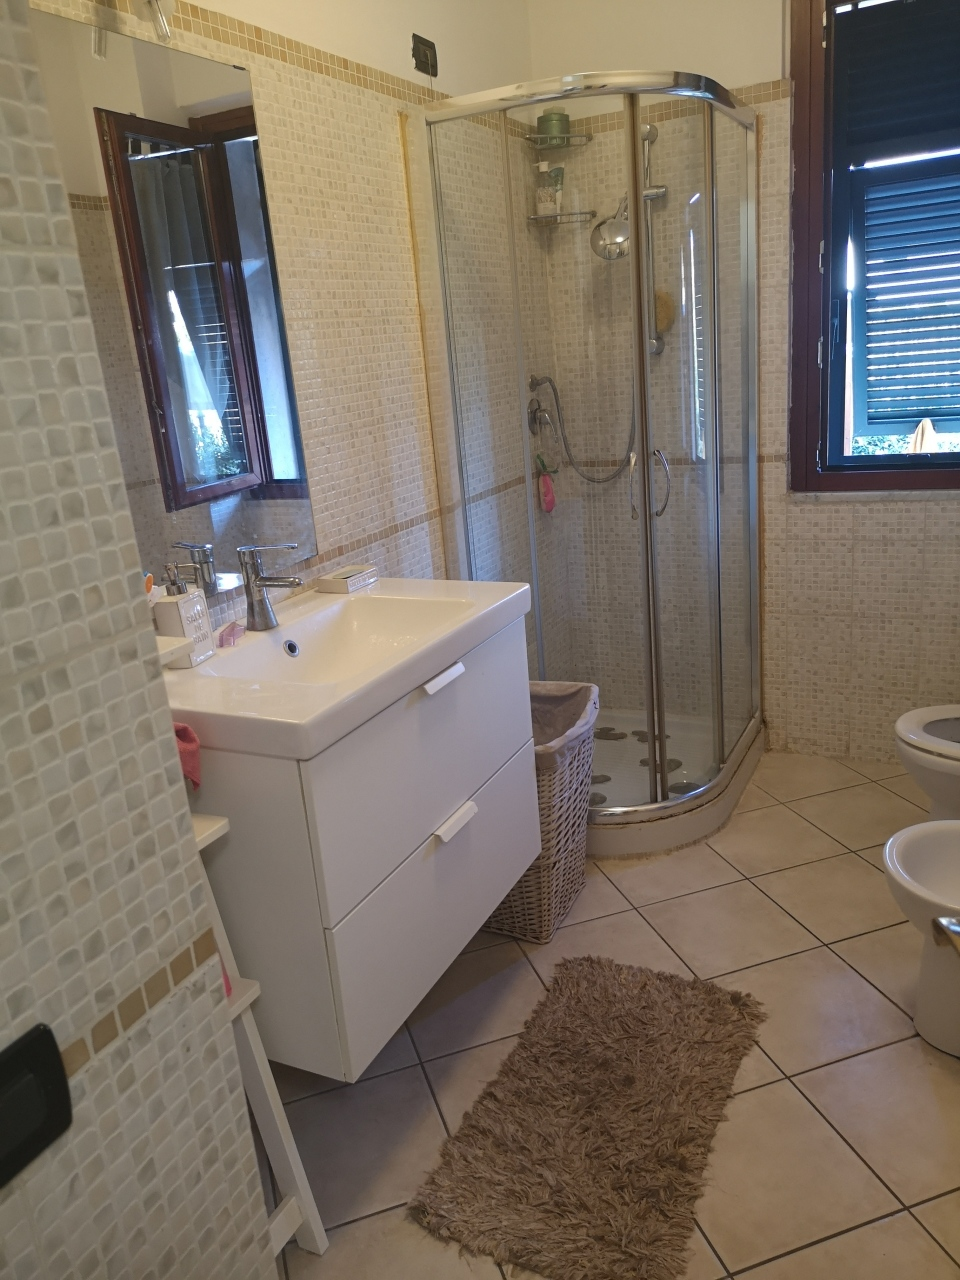 Casa semindipendente in vendita - Caniparola, Fosdinovo